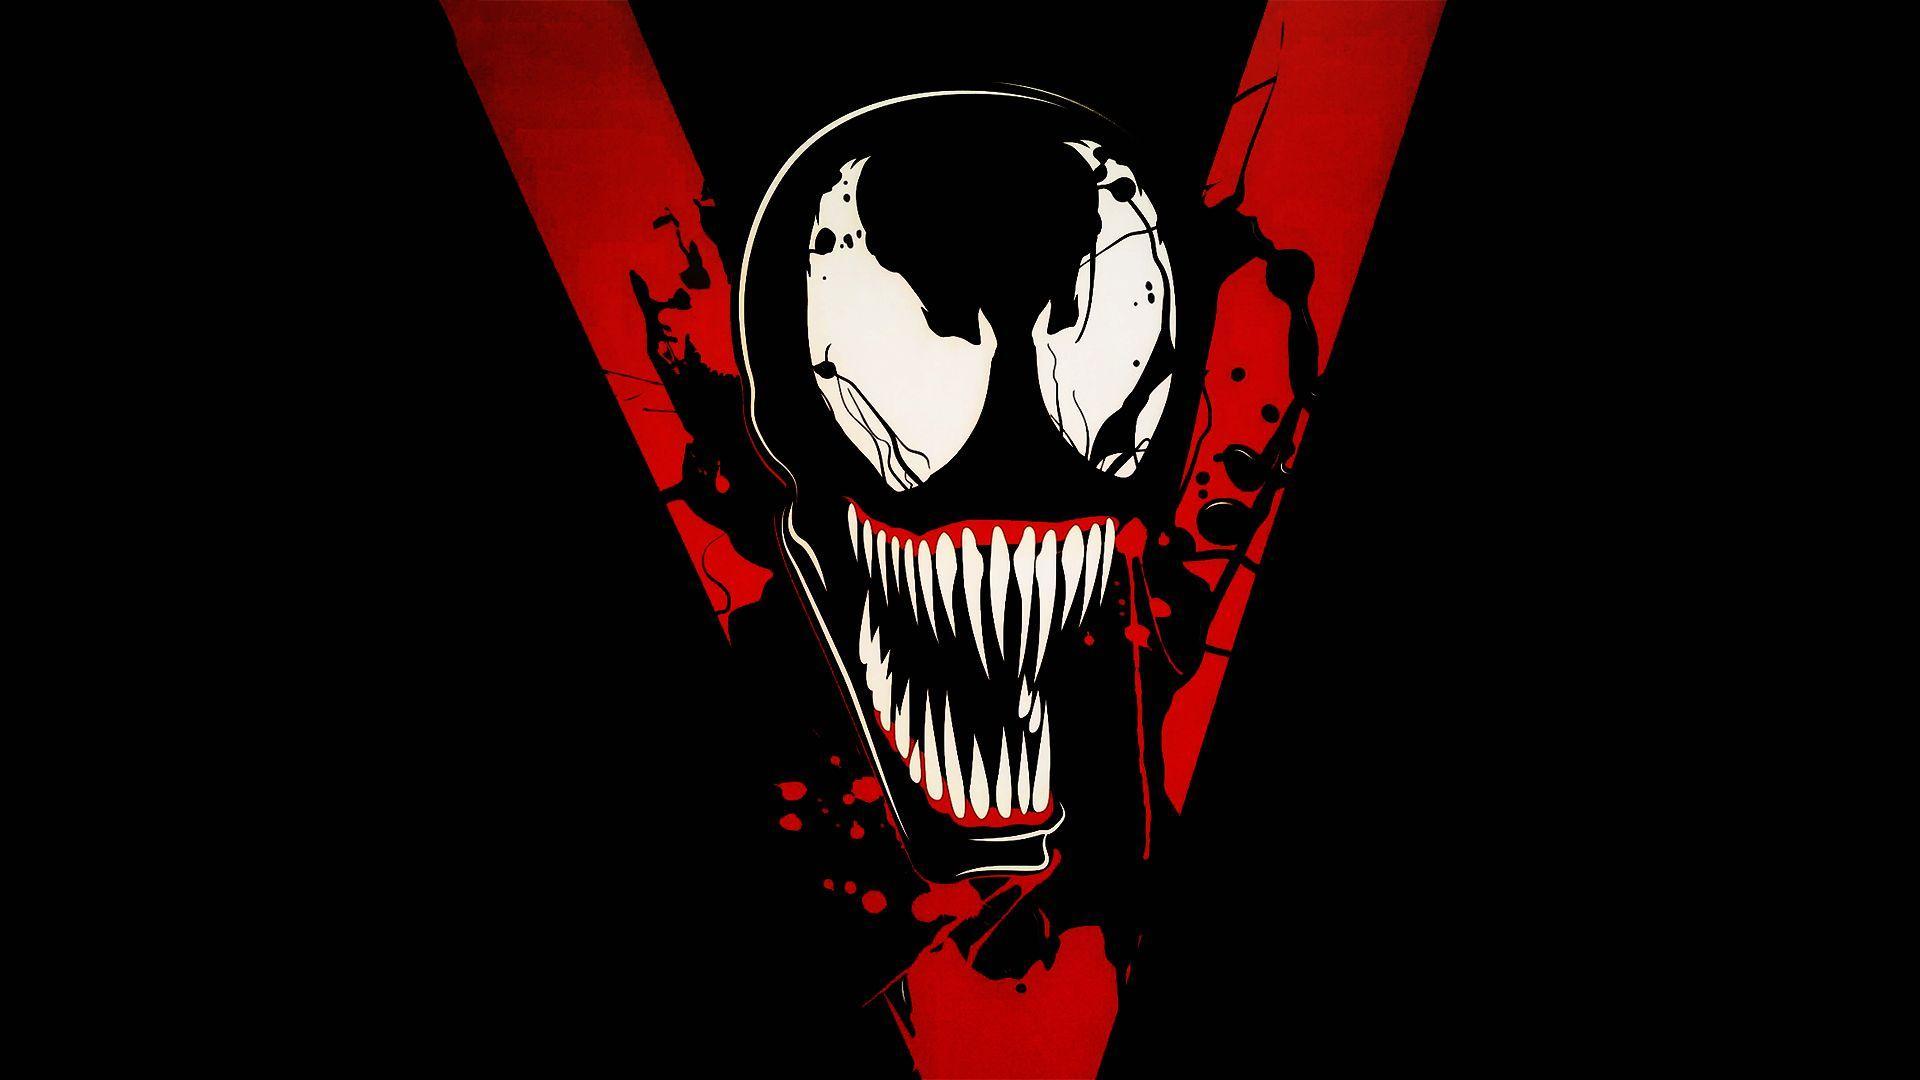 Venom Pc Wallpapers Top Free Venom Pc Backgrounds Wallpaperaccess